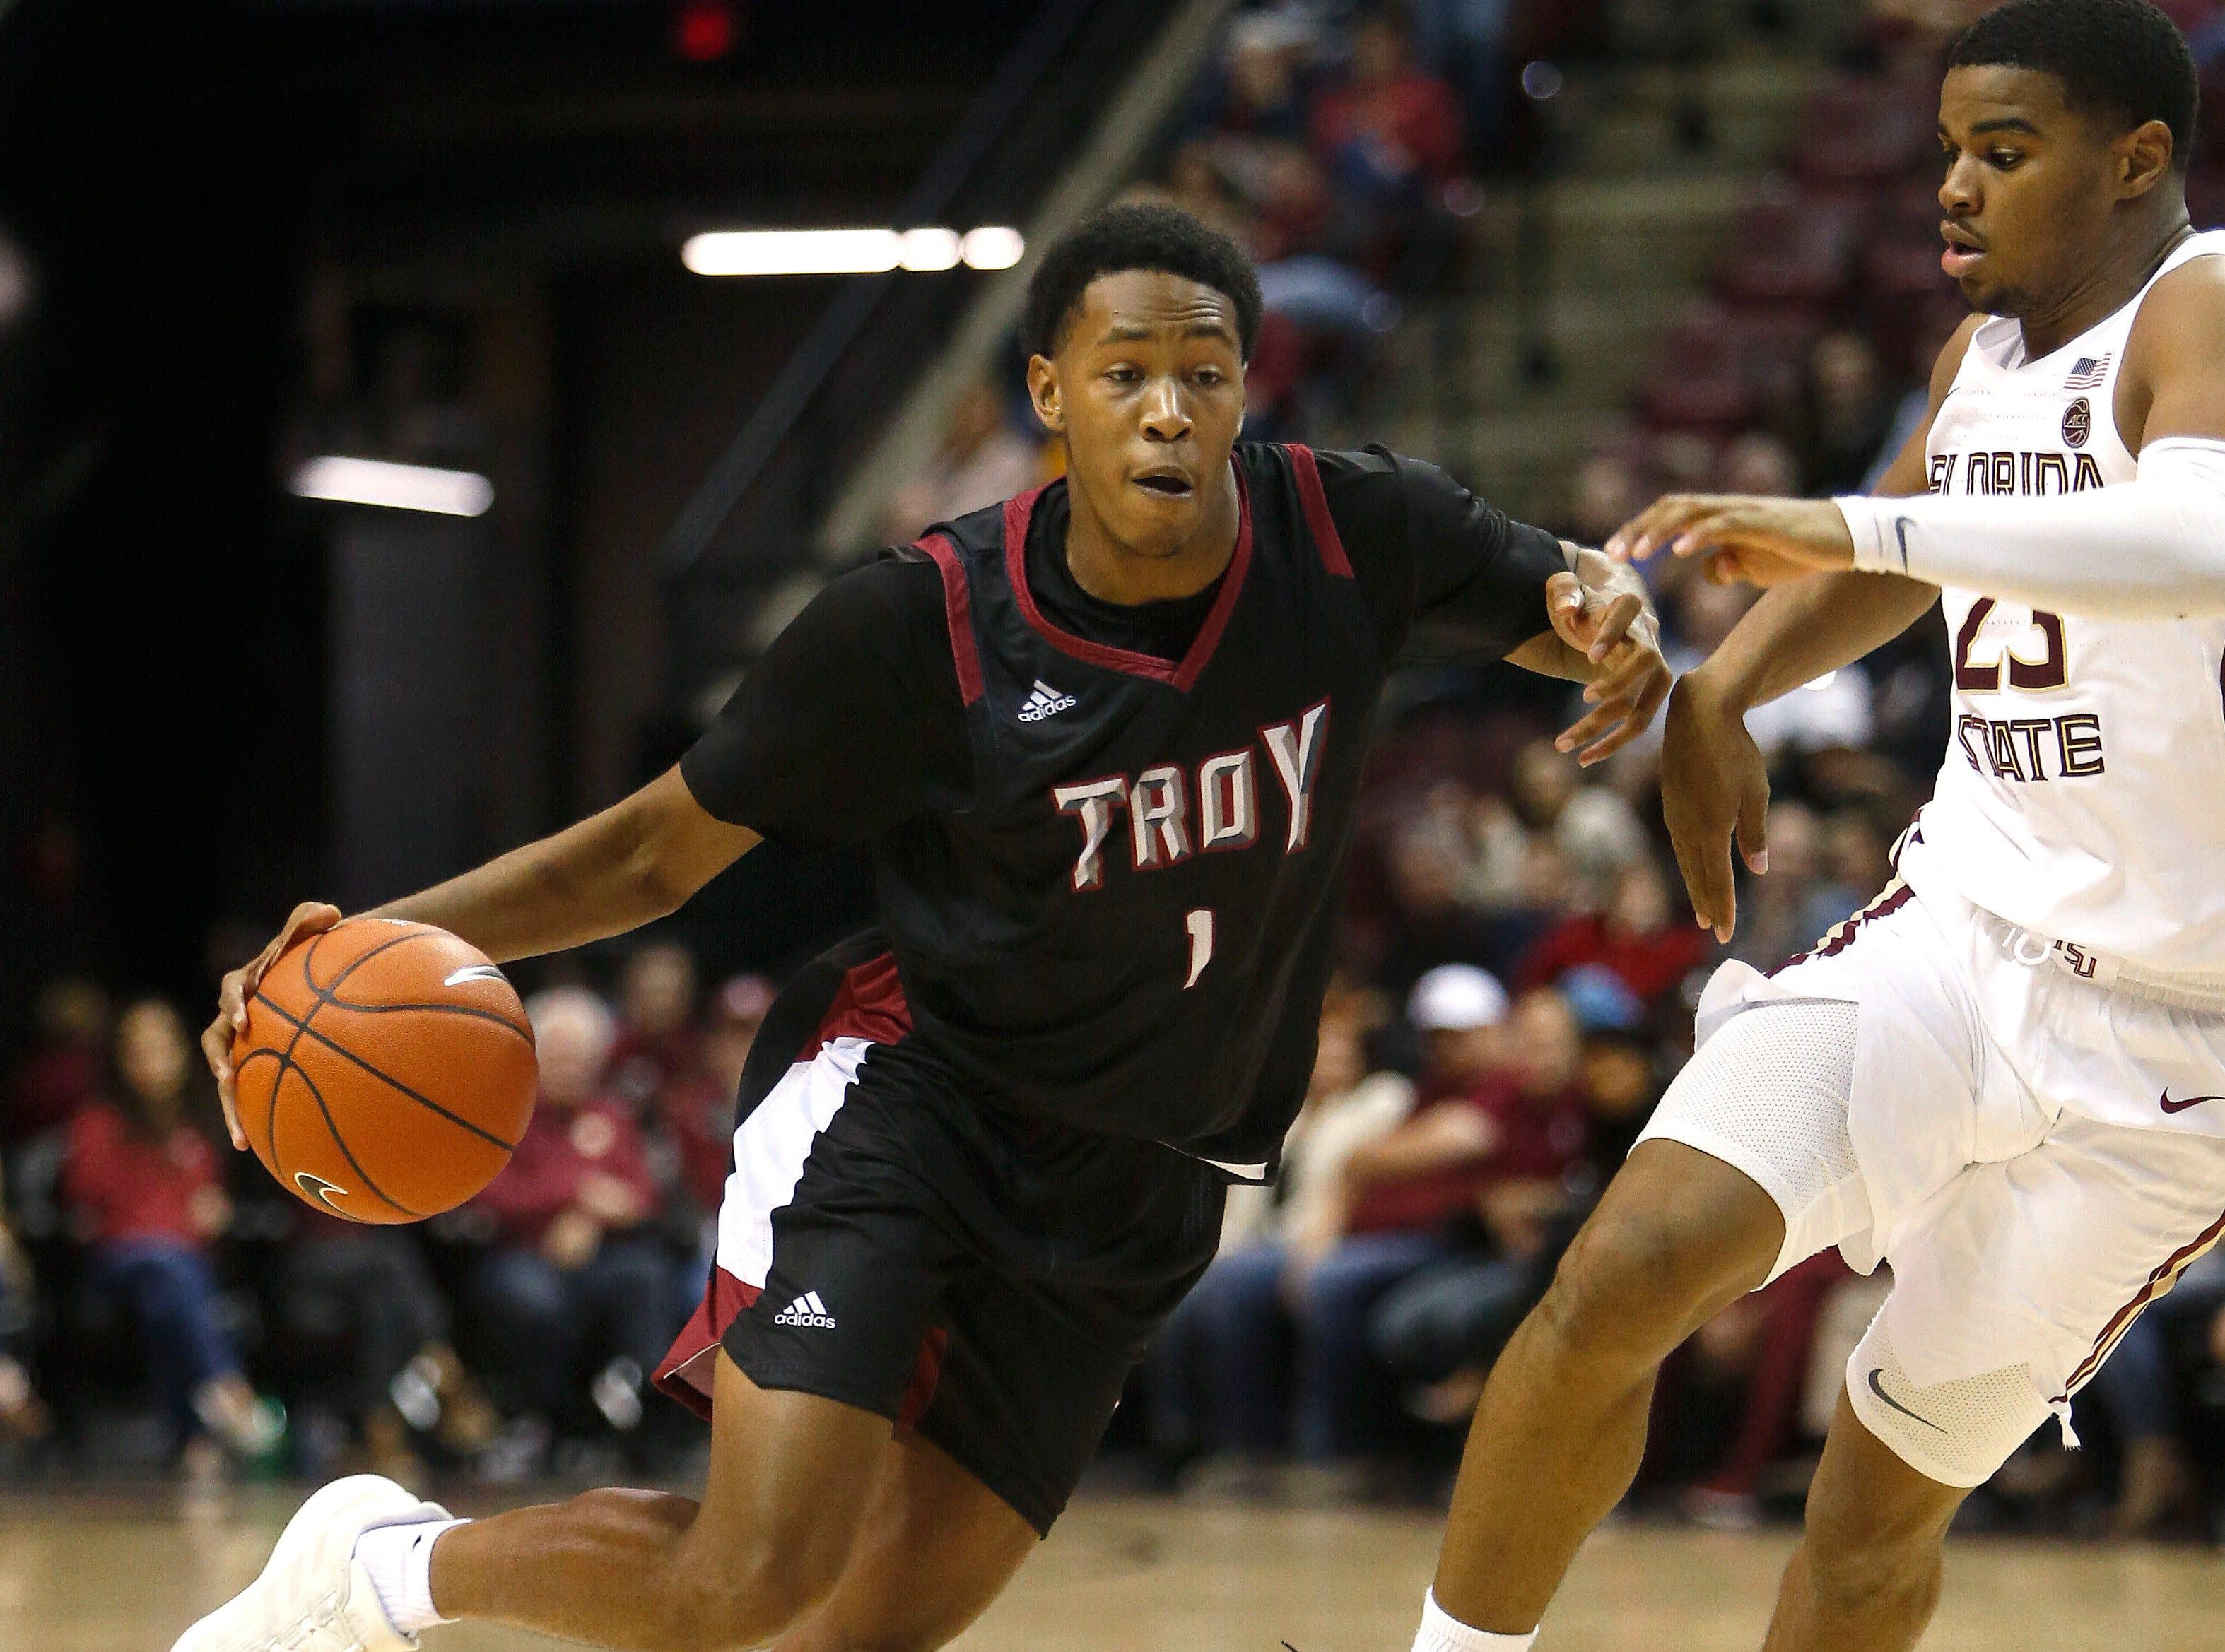 Dec 3, 2018; Tallahassee, FL, USA; Troy Trojans forward Javan Johnson (1) drives abasing Florida State Seminoles guard M.J. Walker (23) at Donald L. Tucker Center during the second half. Mandatory Credit: Glenn Beil-USA TODAY Sports